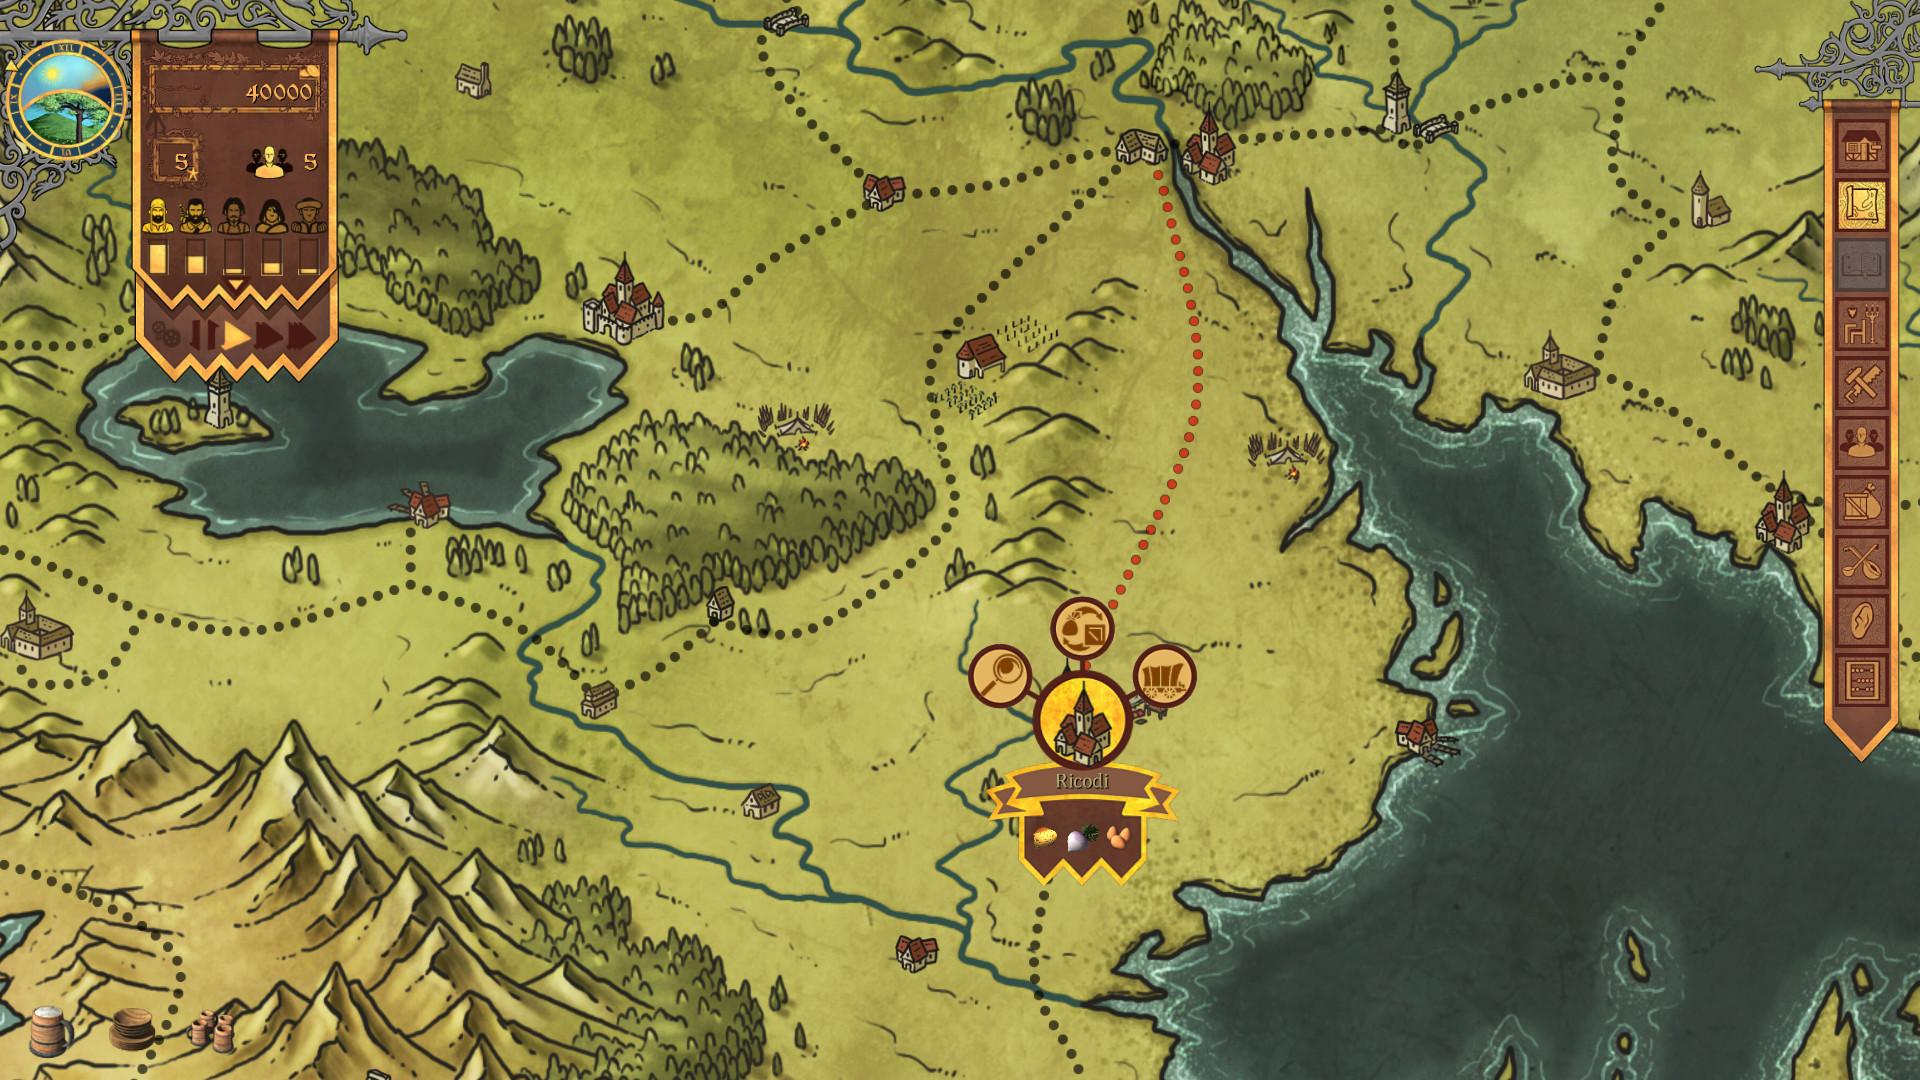 crossroads-inn-anniversary-edition-pc-screenshot-01